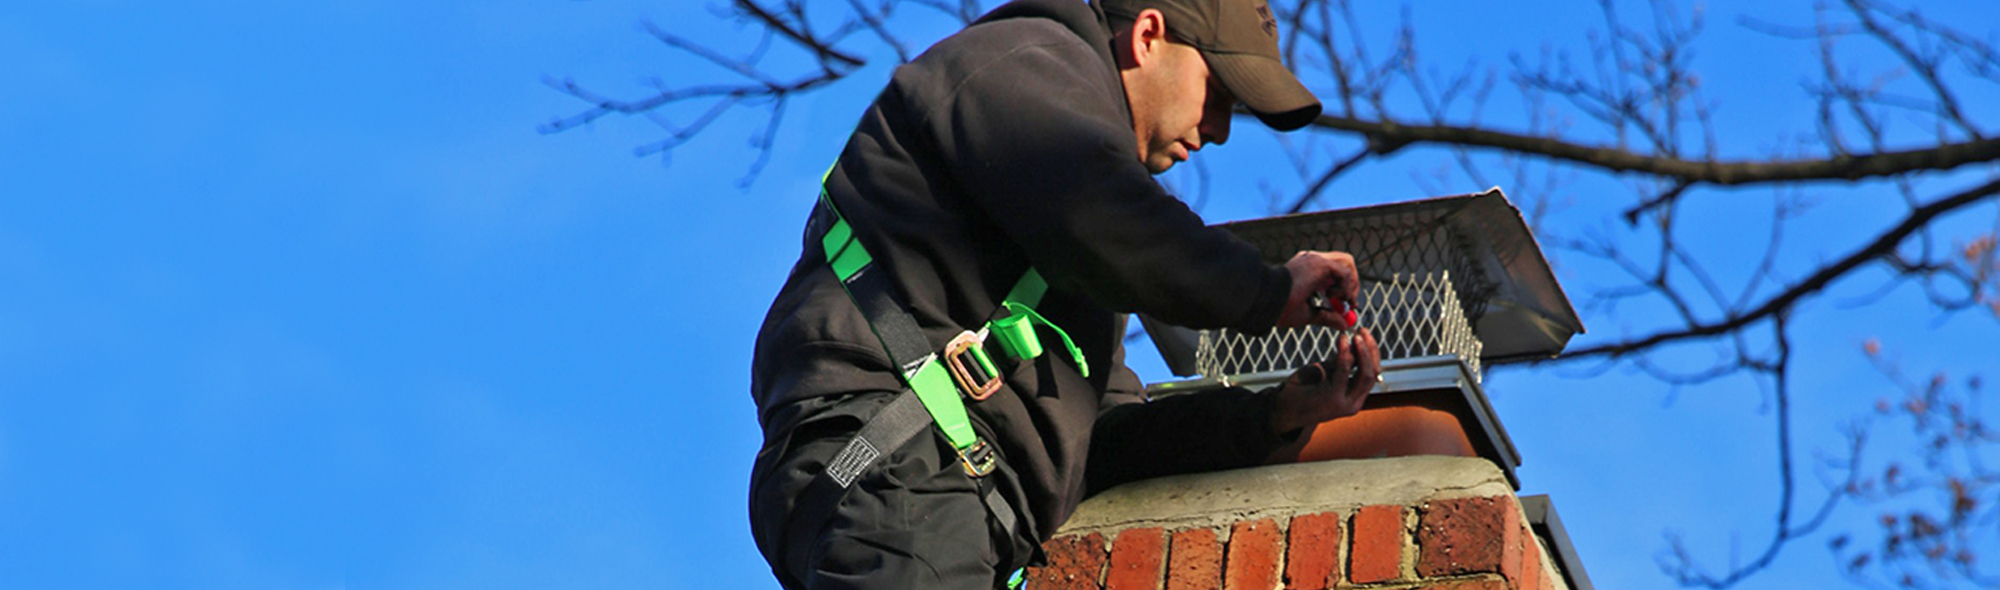 leaky chimney repair with chimney cap in gaithersburg md